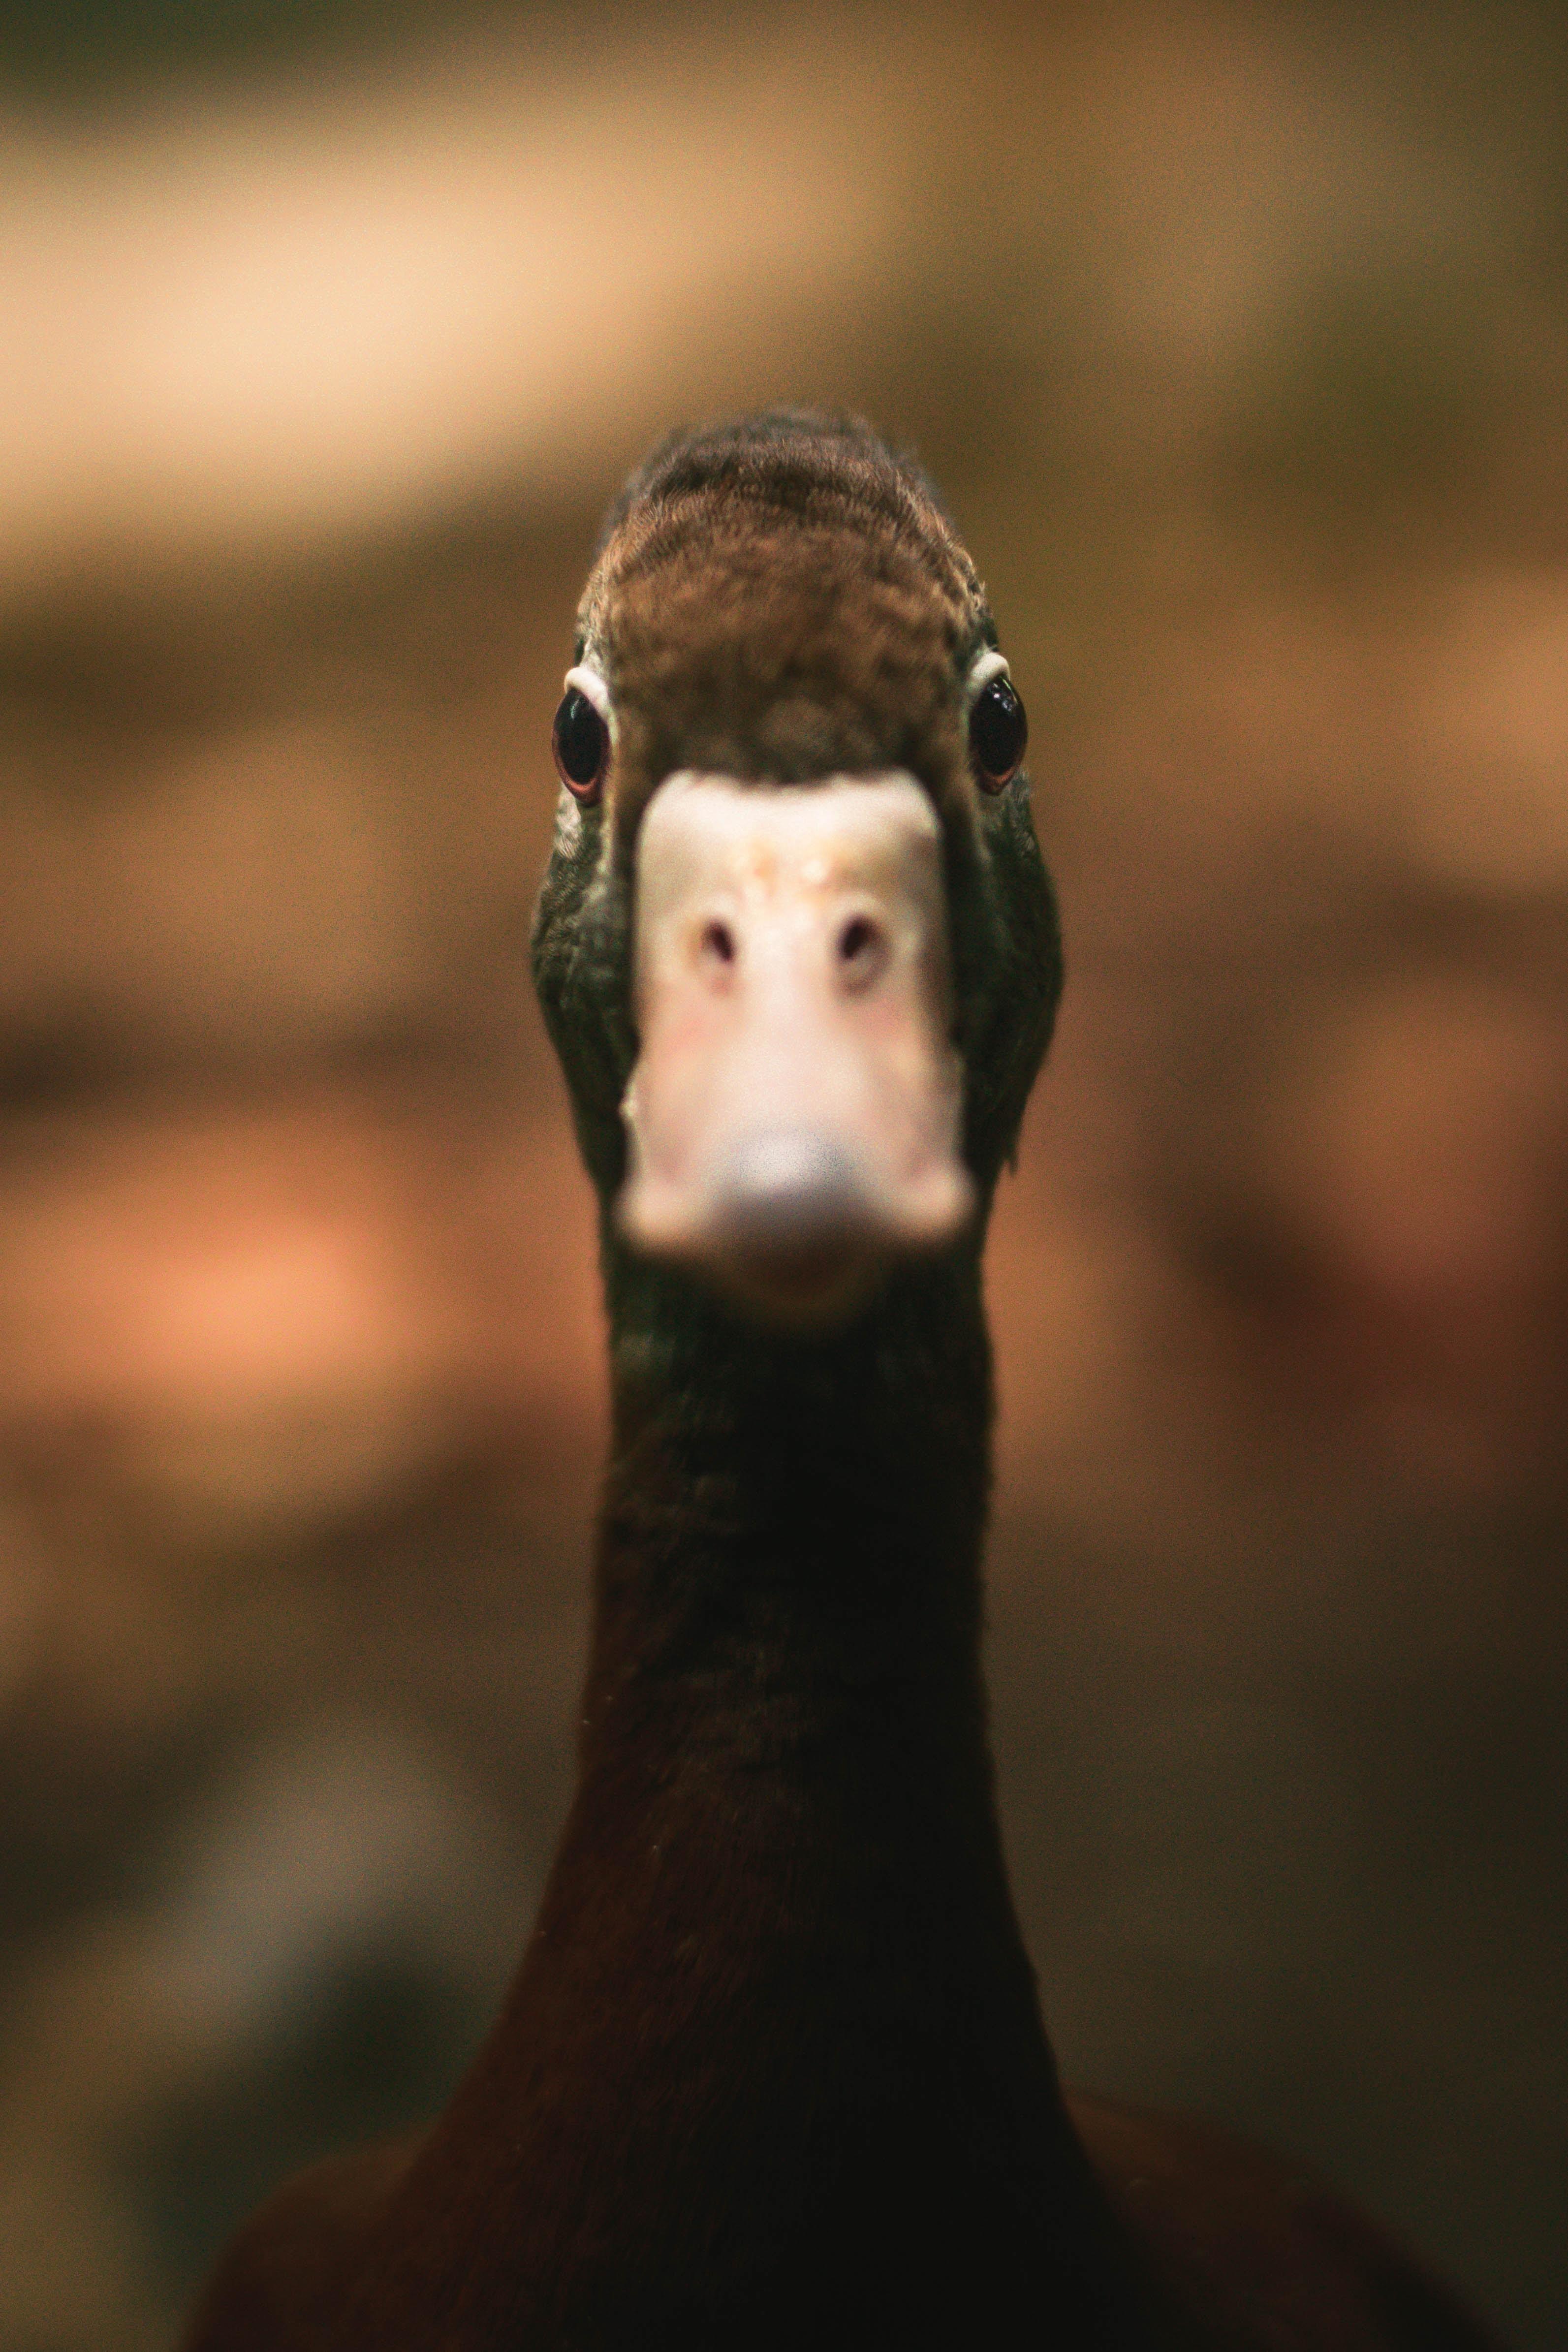 closeup photo of duck face